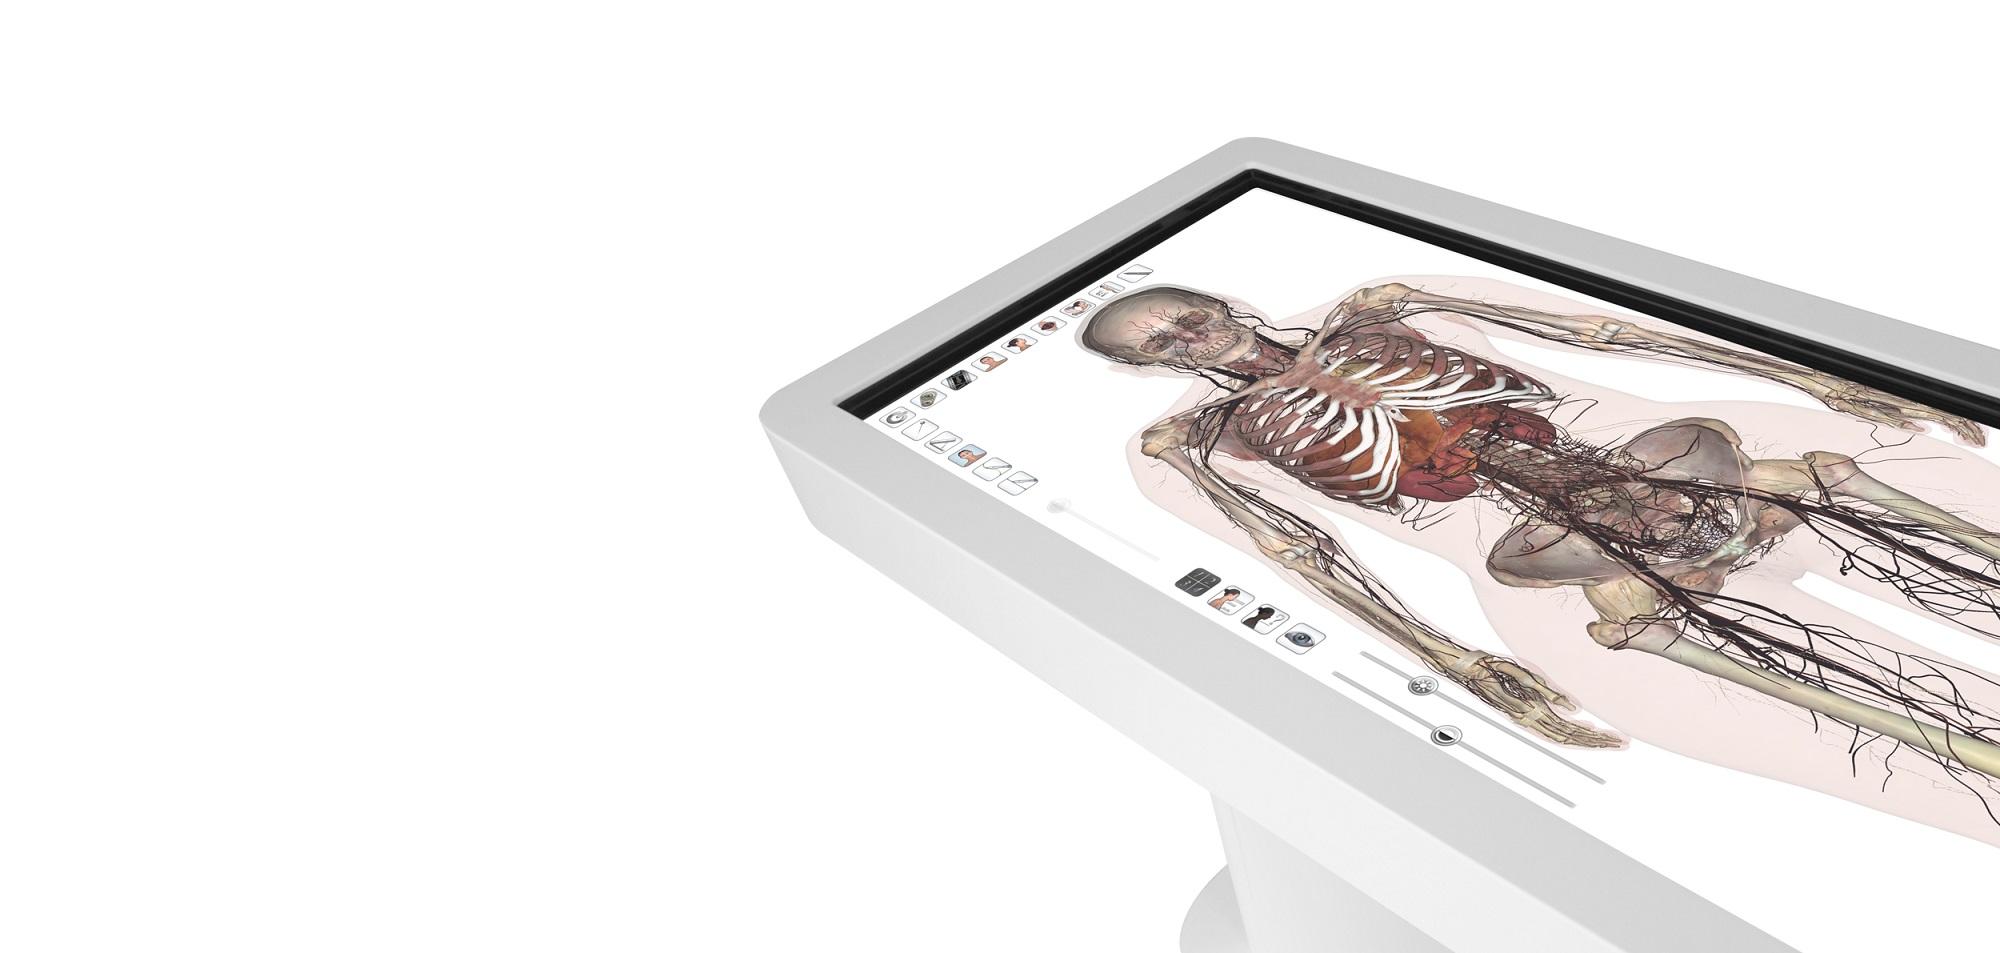 Anatomage Medical Home | Anatomage